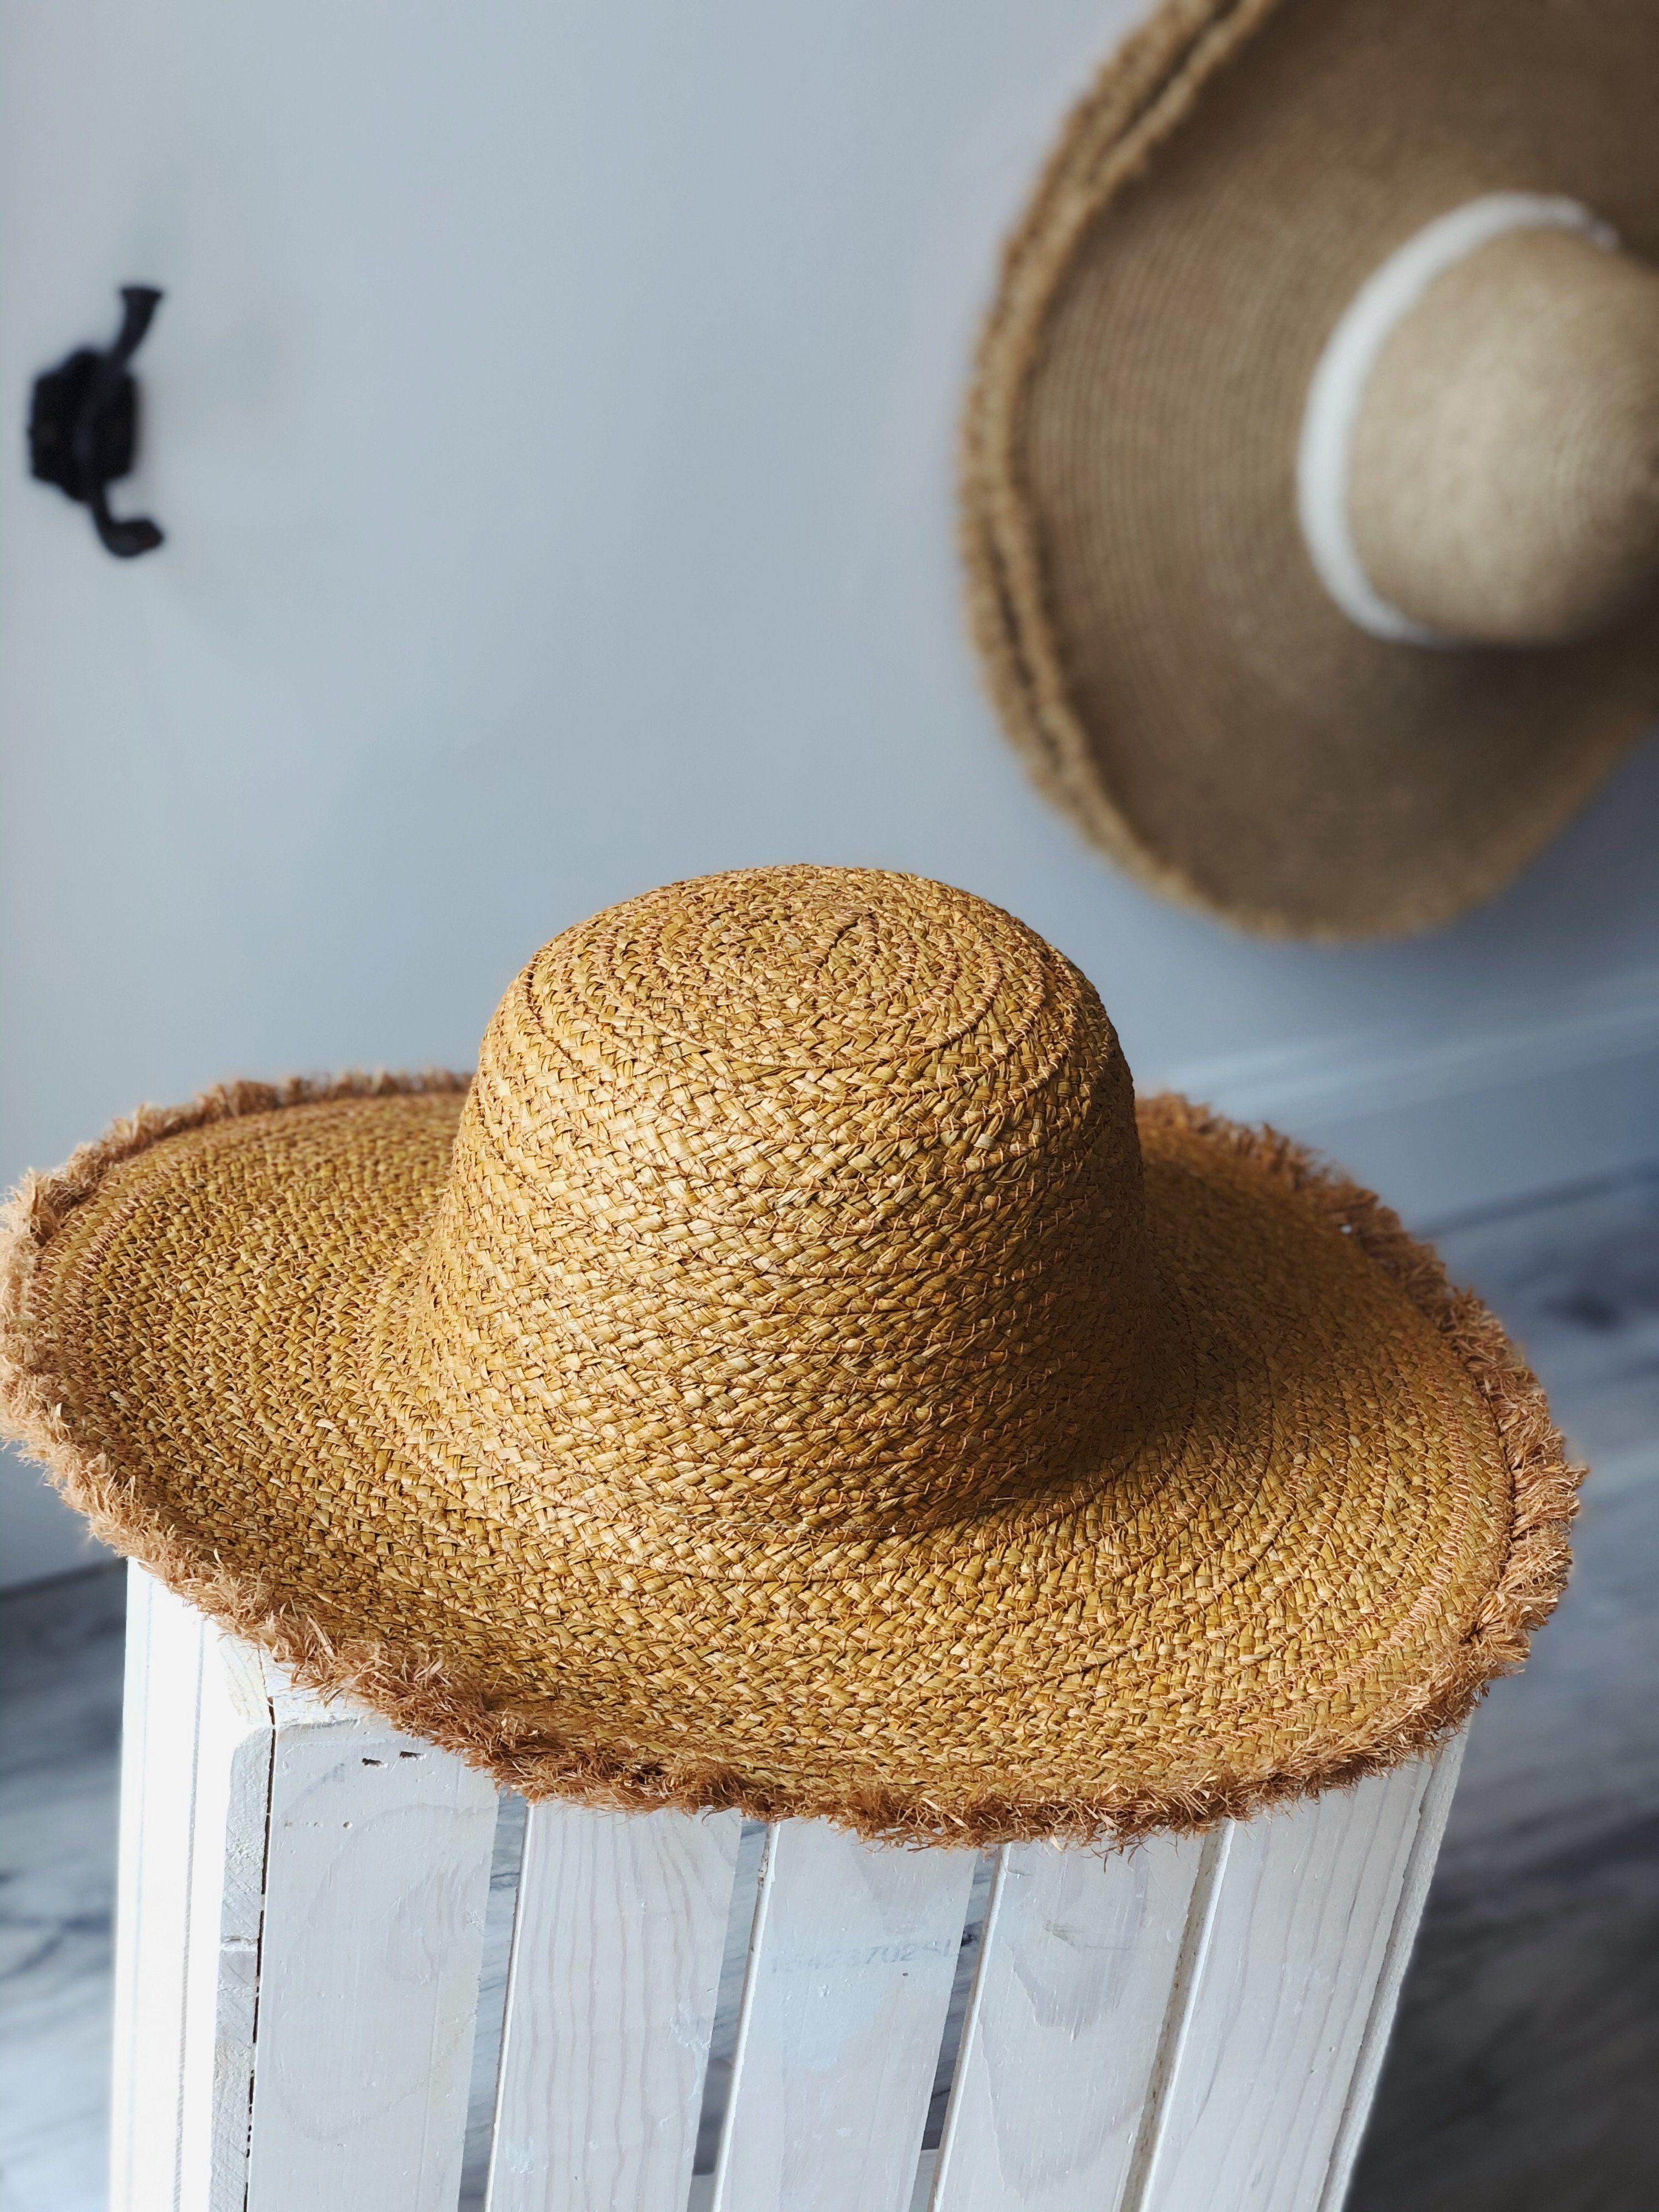 Natural Raffia Baseball Cap for Women Summer Straw Sun Hats Bridesmaid Bride Bachelorette Gift Wedding Favors